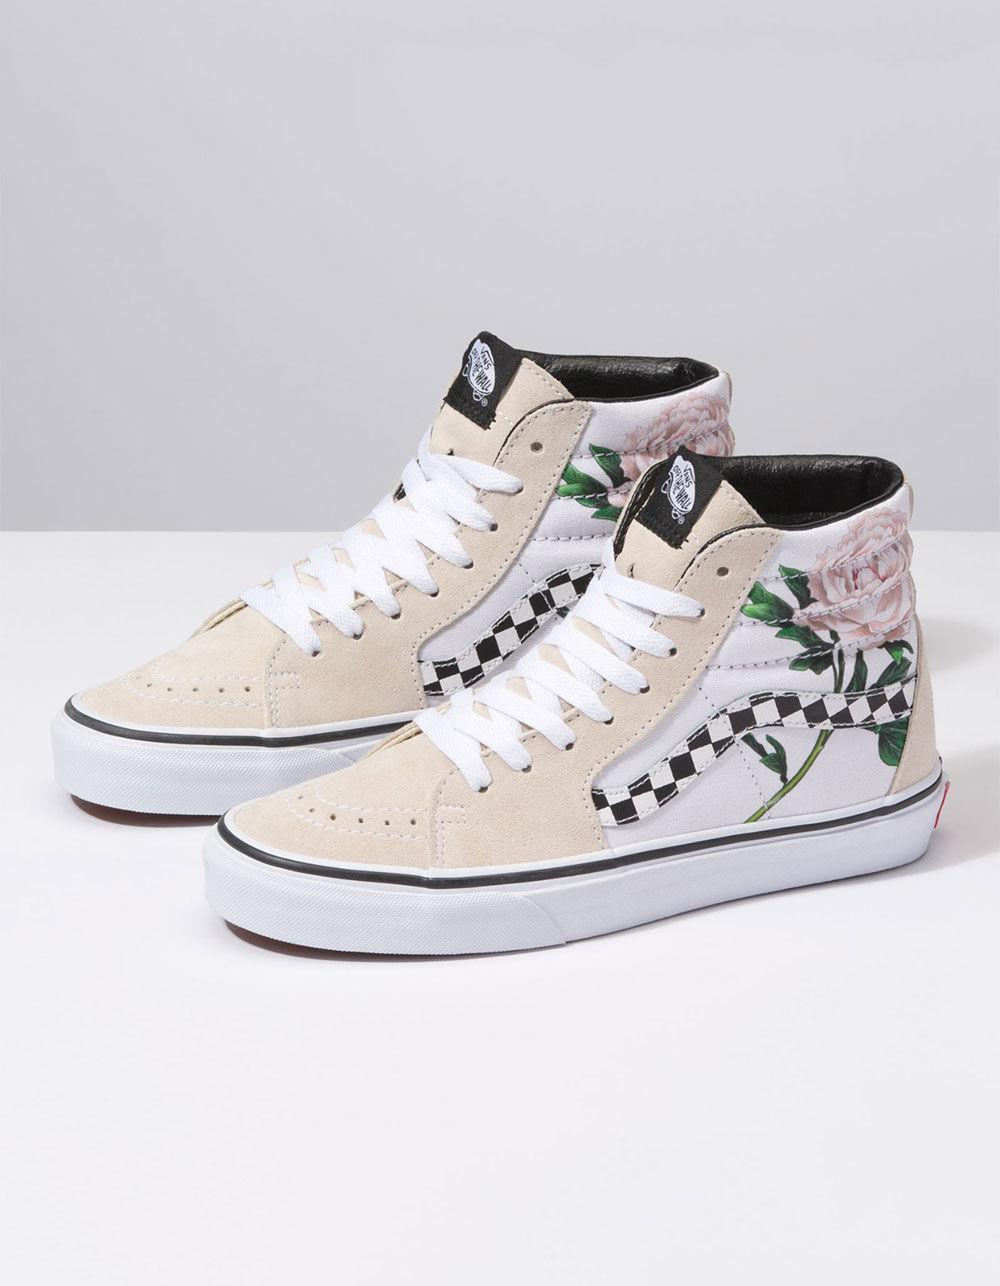 69db06e7daa7 Lyst - Vans Sk8-hi Checker Floral Womens Shoes